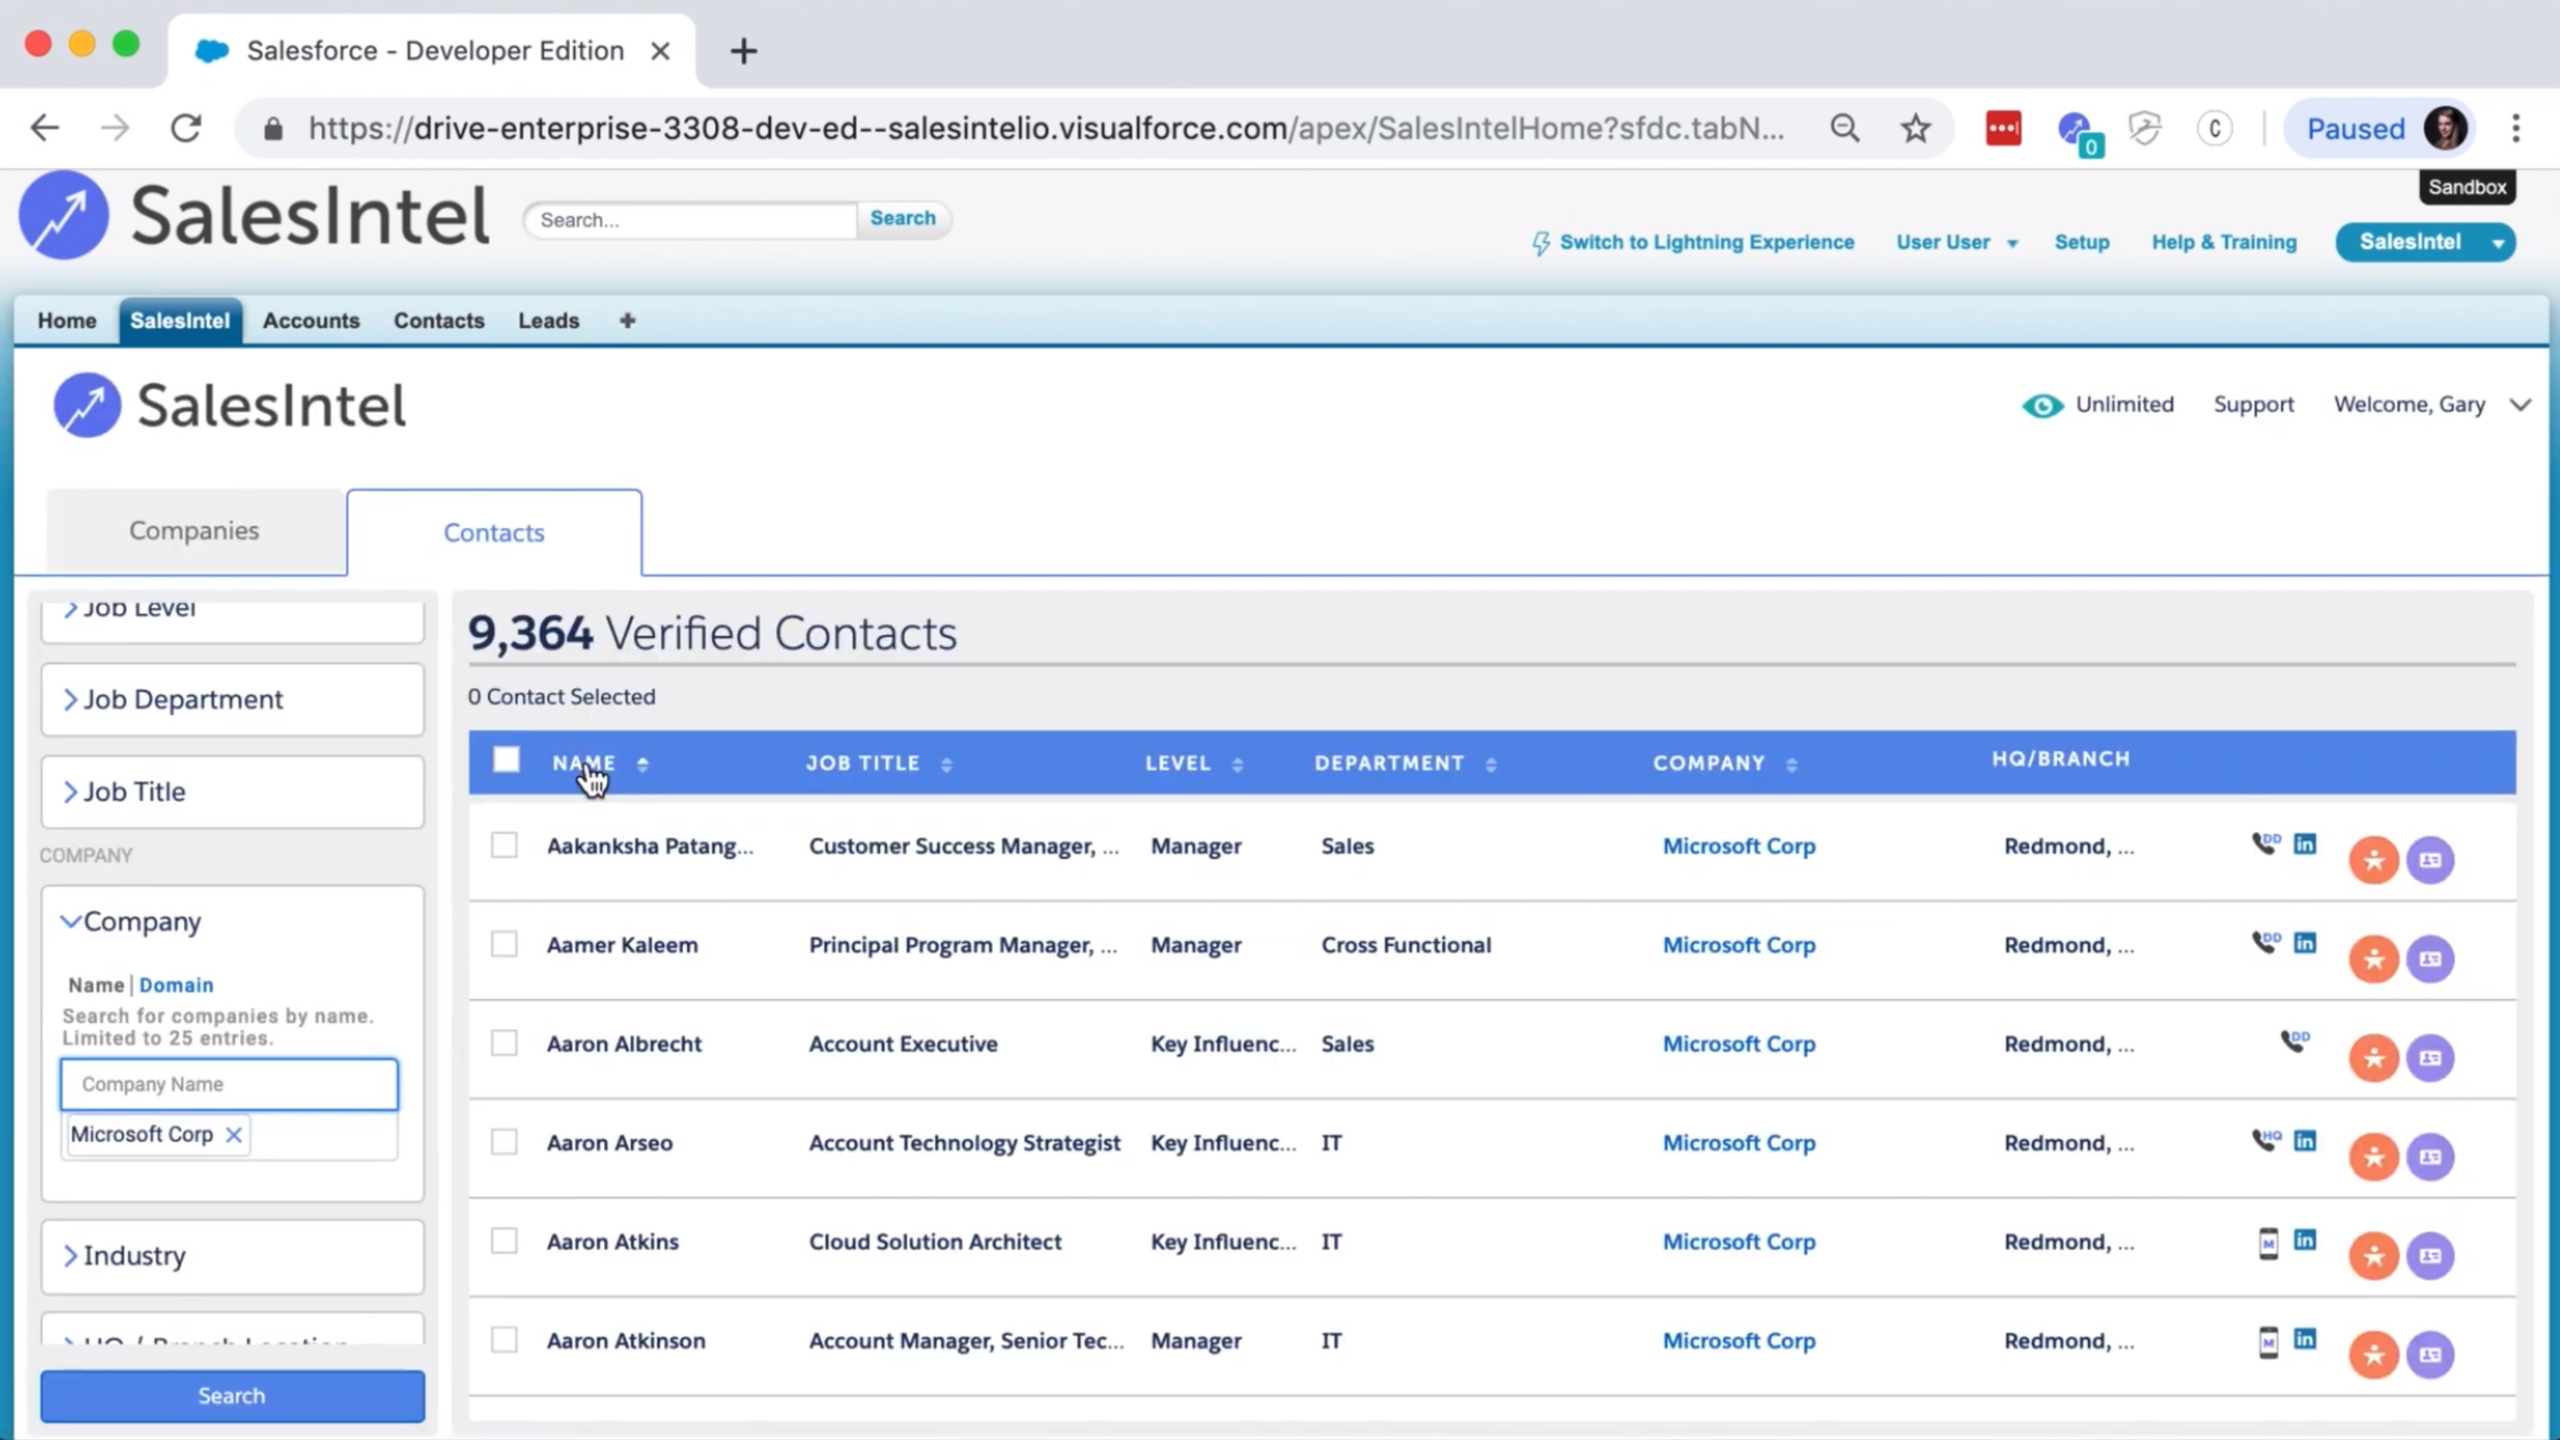 Salesforce Integration with SalesIntel